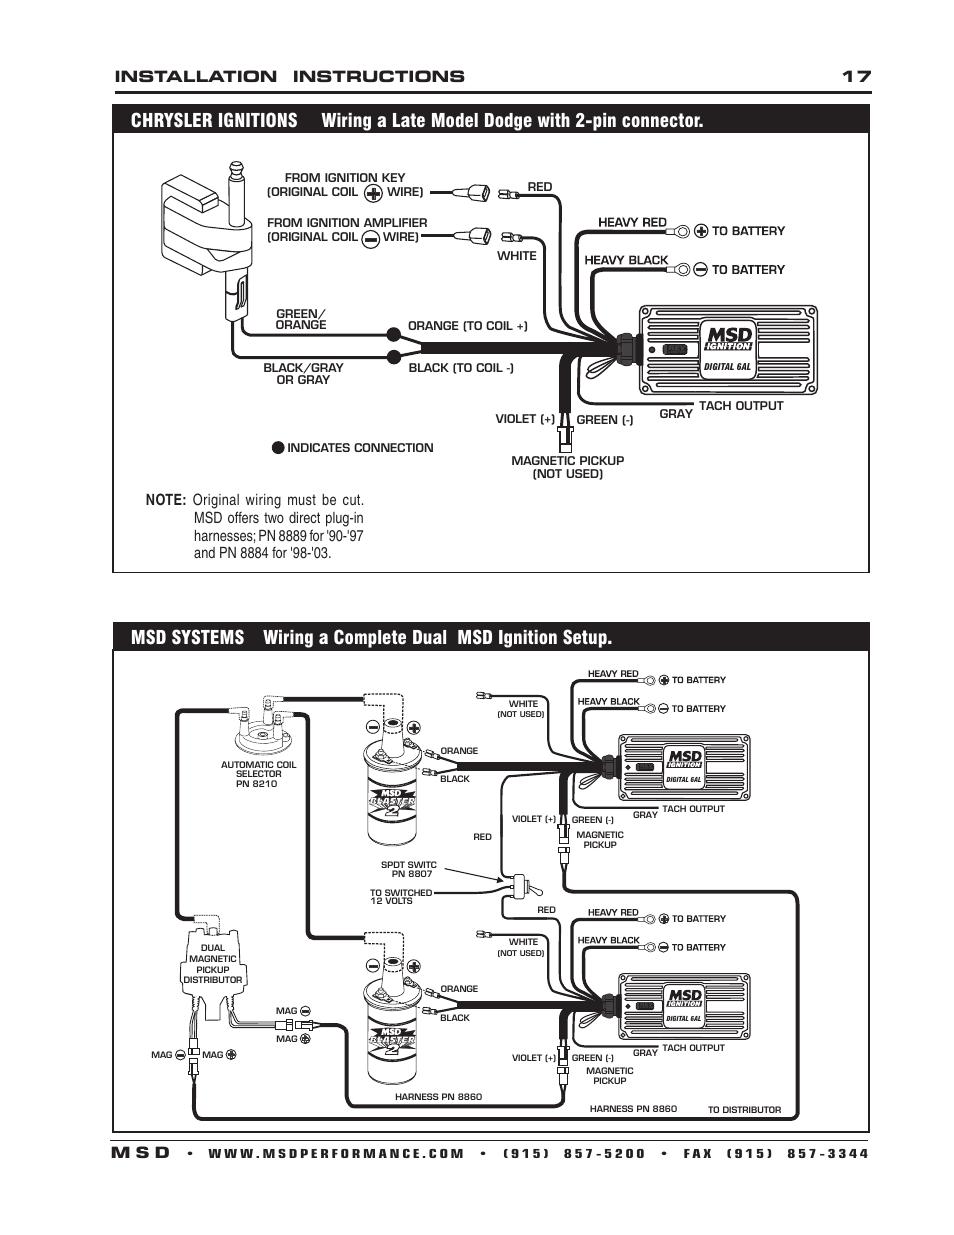 hight resolution of msd 6201 wiring diagram simple wiring diagram rh 20 berlinsky airline de 6200 msd 6a wiring msd 6201 ignition wiring diagram gm